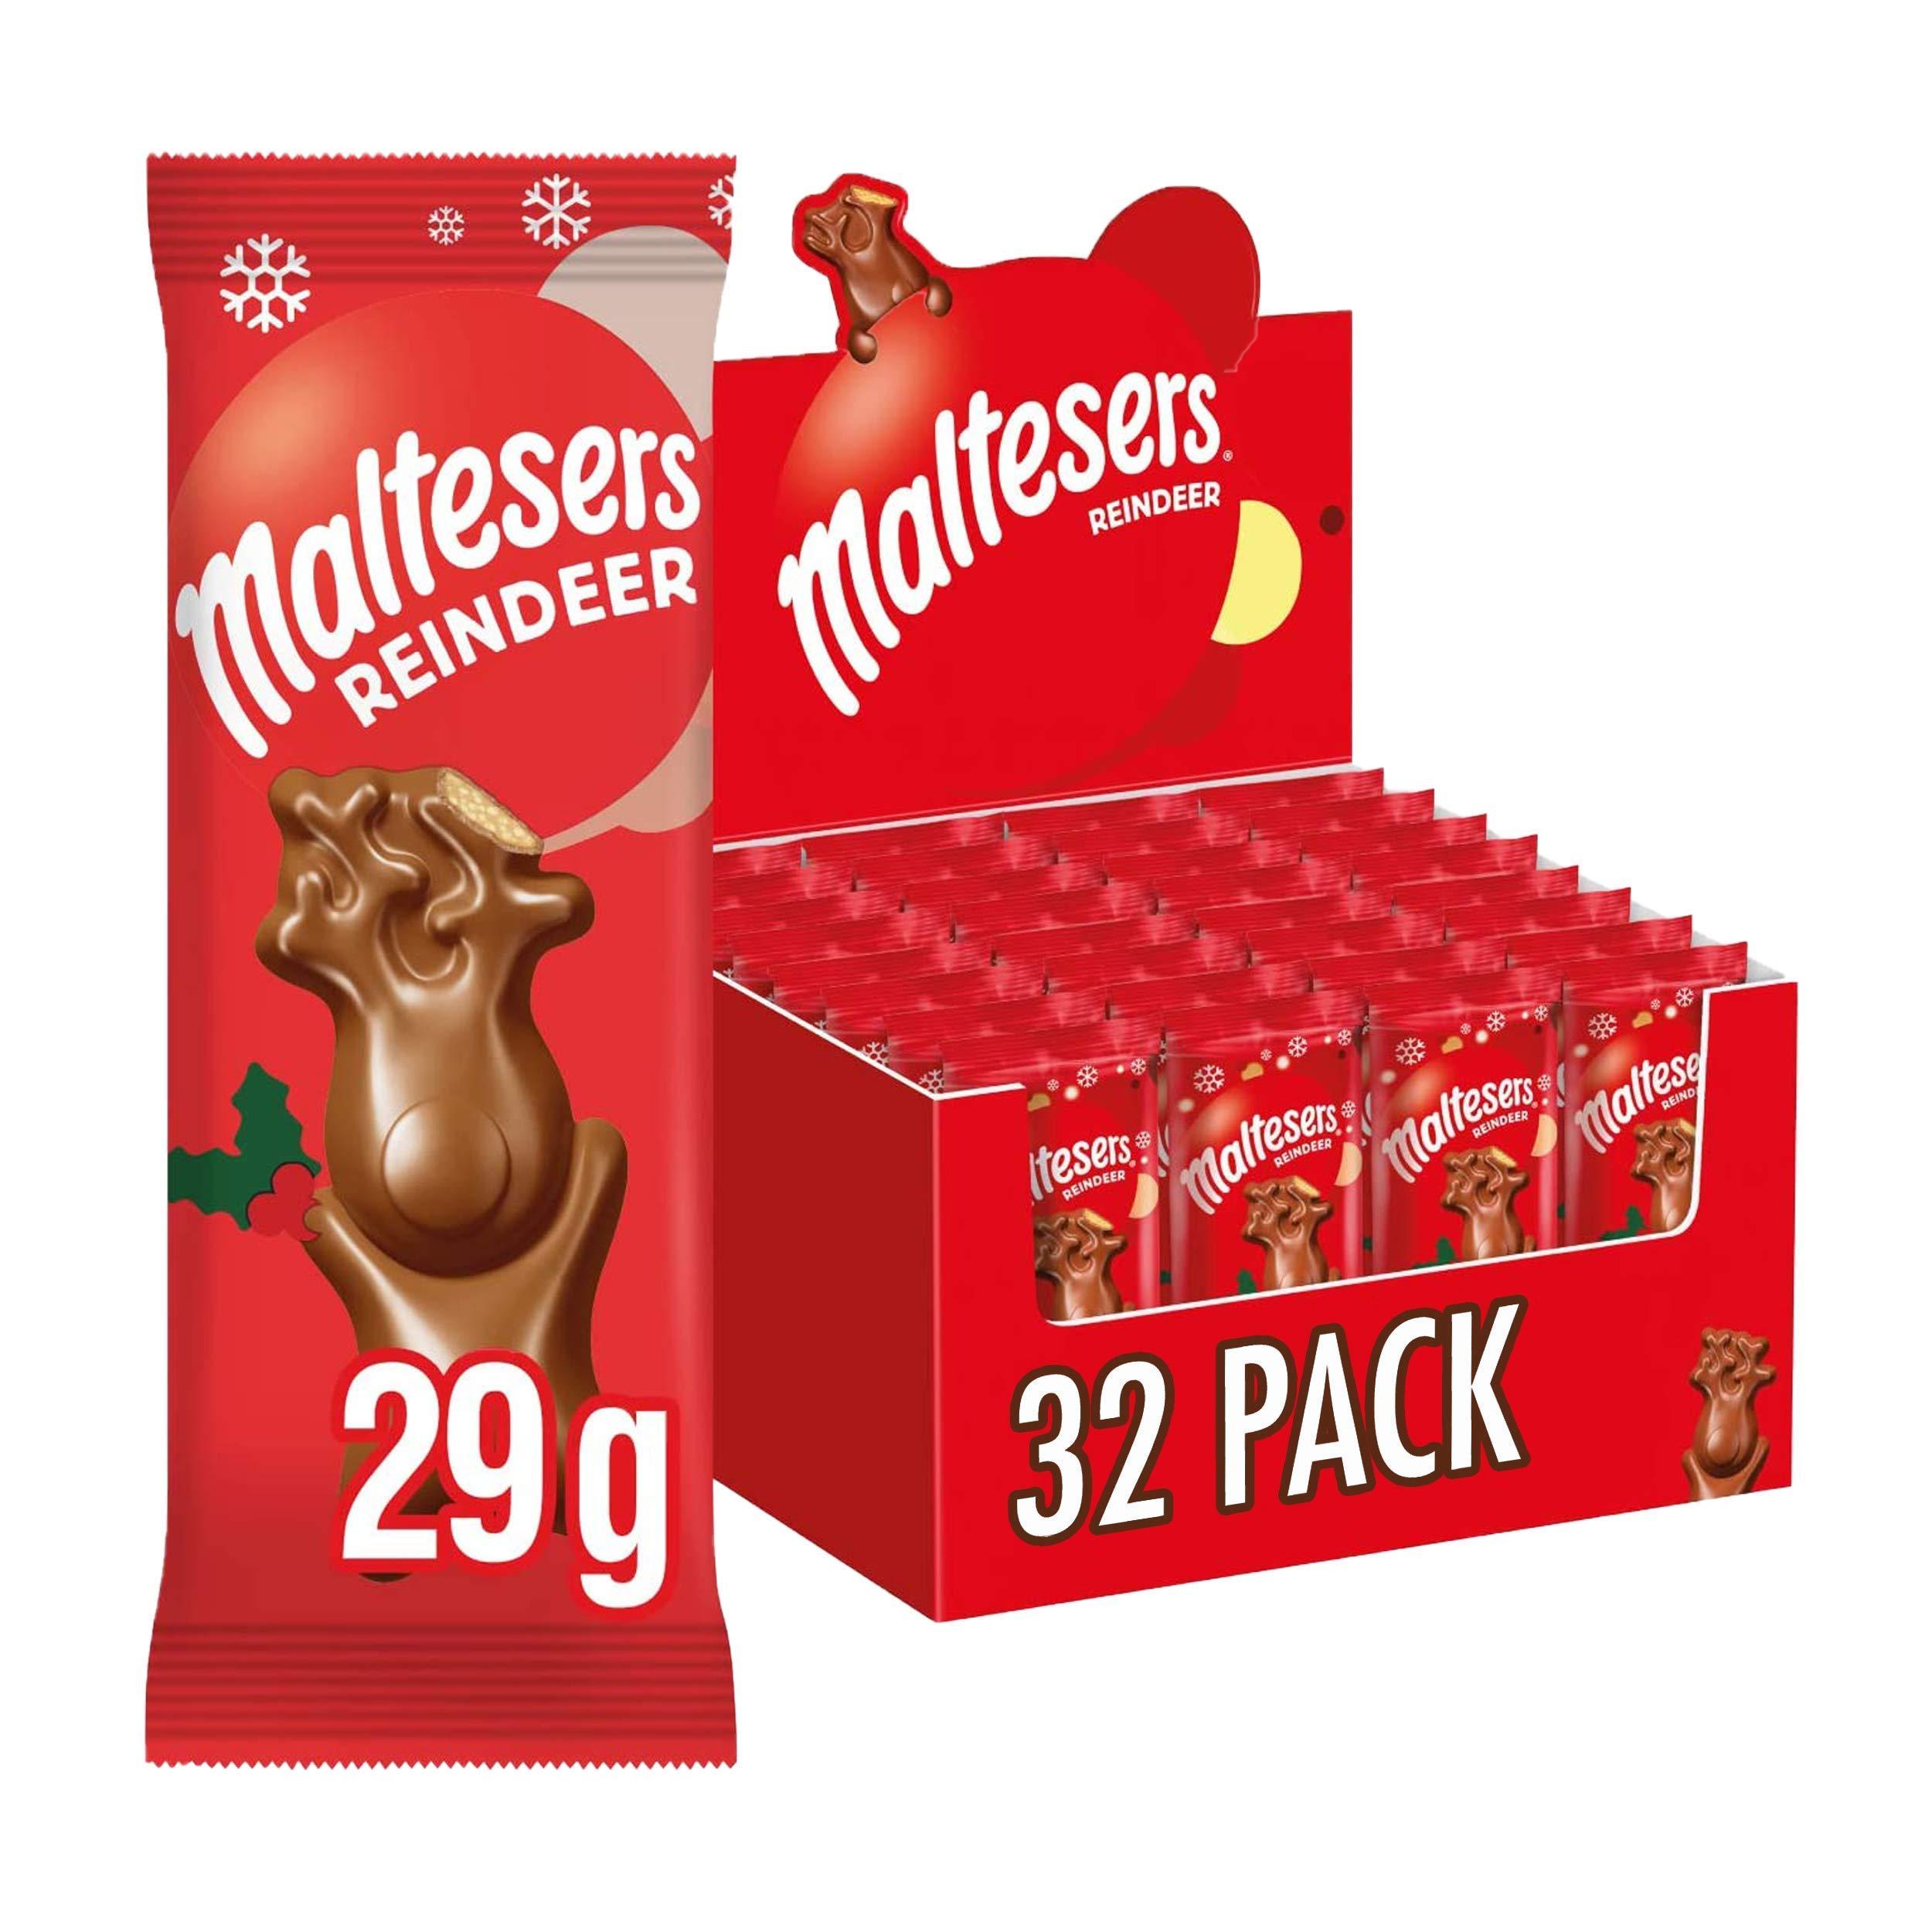 Maltesers Reindeer, Christmas Chocolate Stocking Fillers, 32 Packs of 29 g